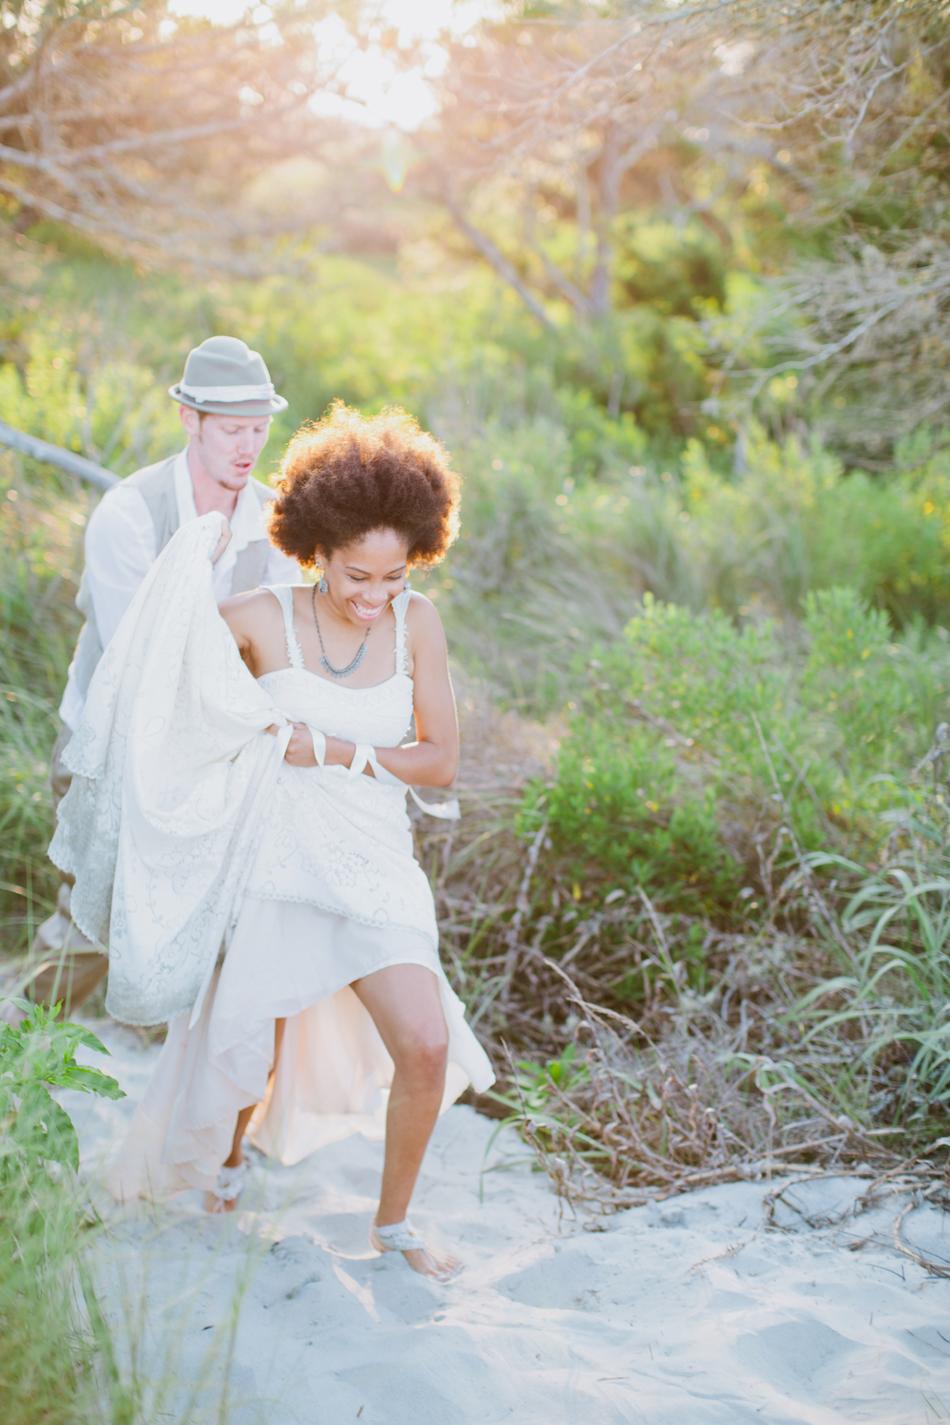 Jameykay_arlie_bohemian_elopement_styled_shoot065.jpg